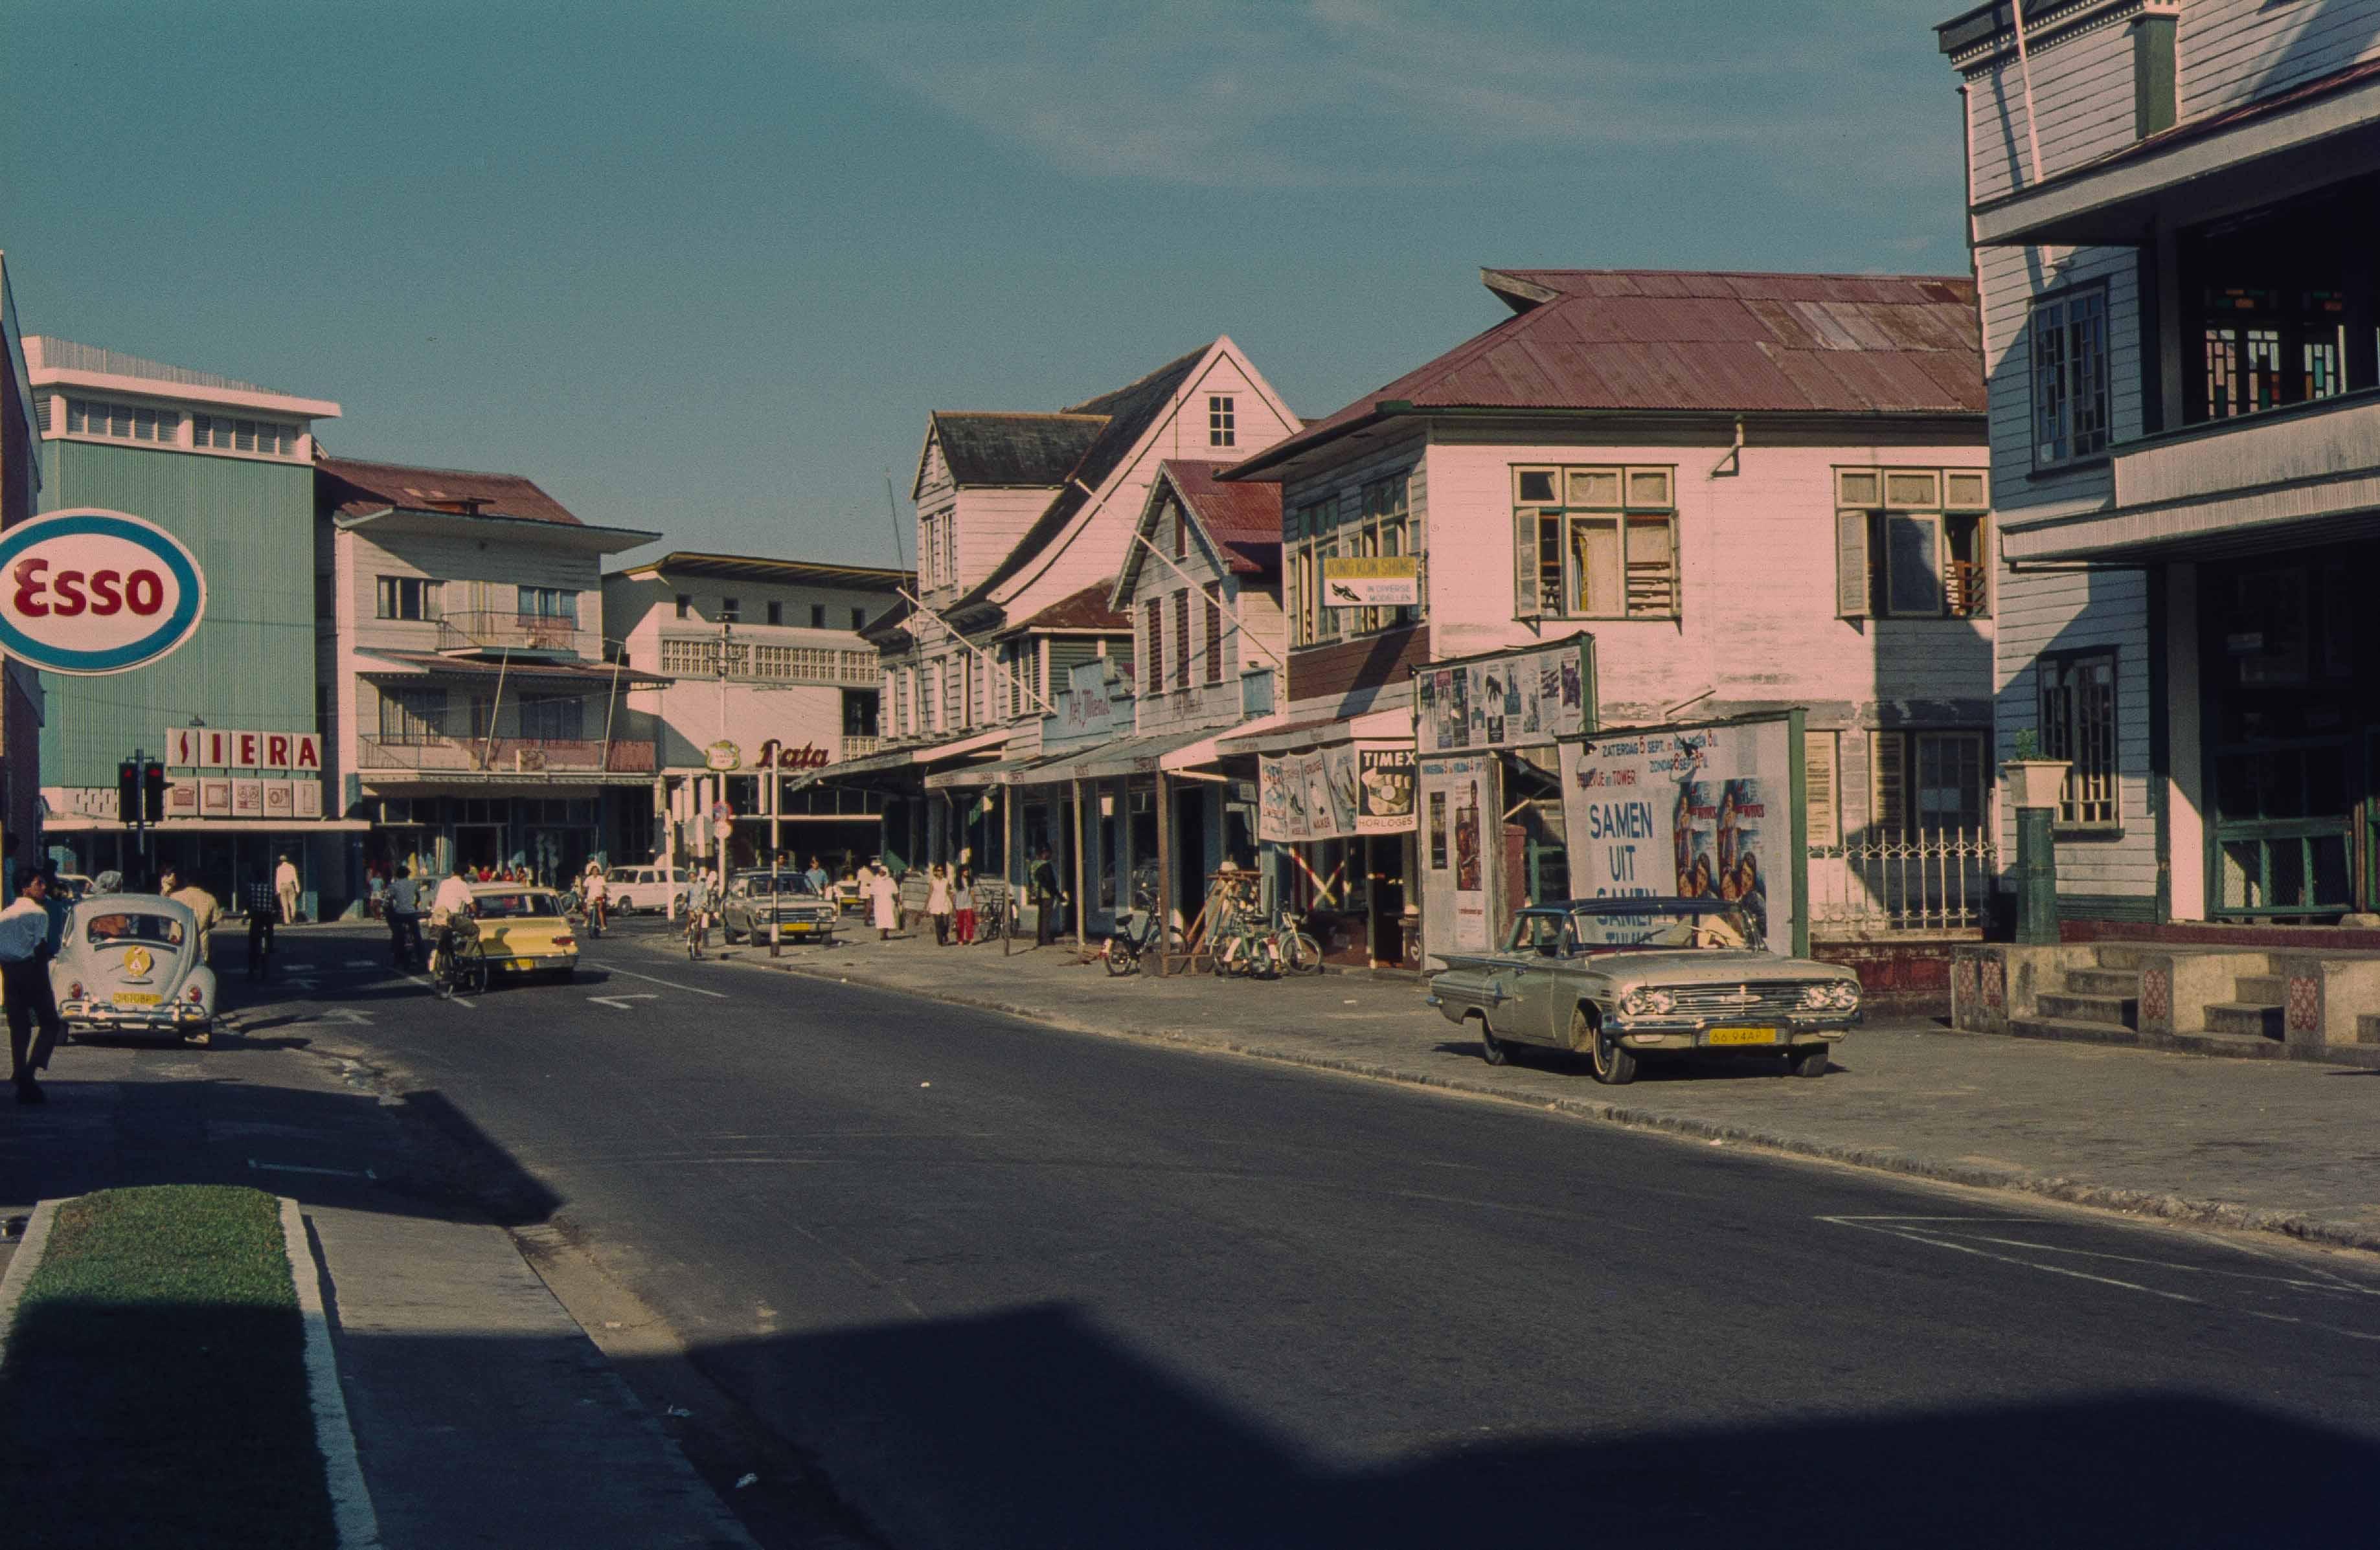 151. Suriname